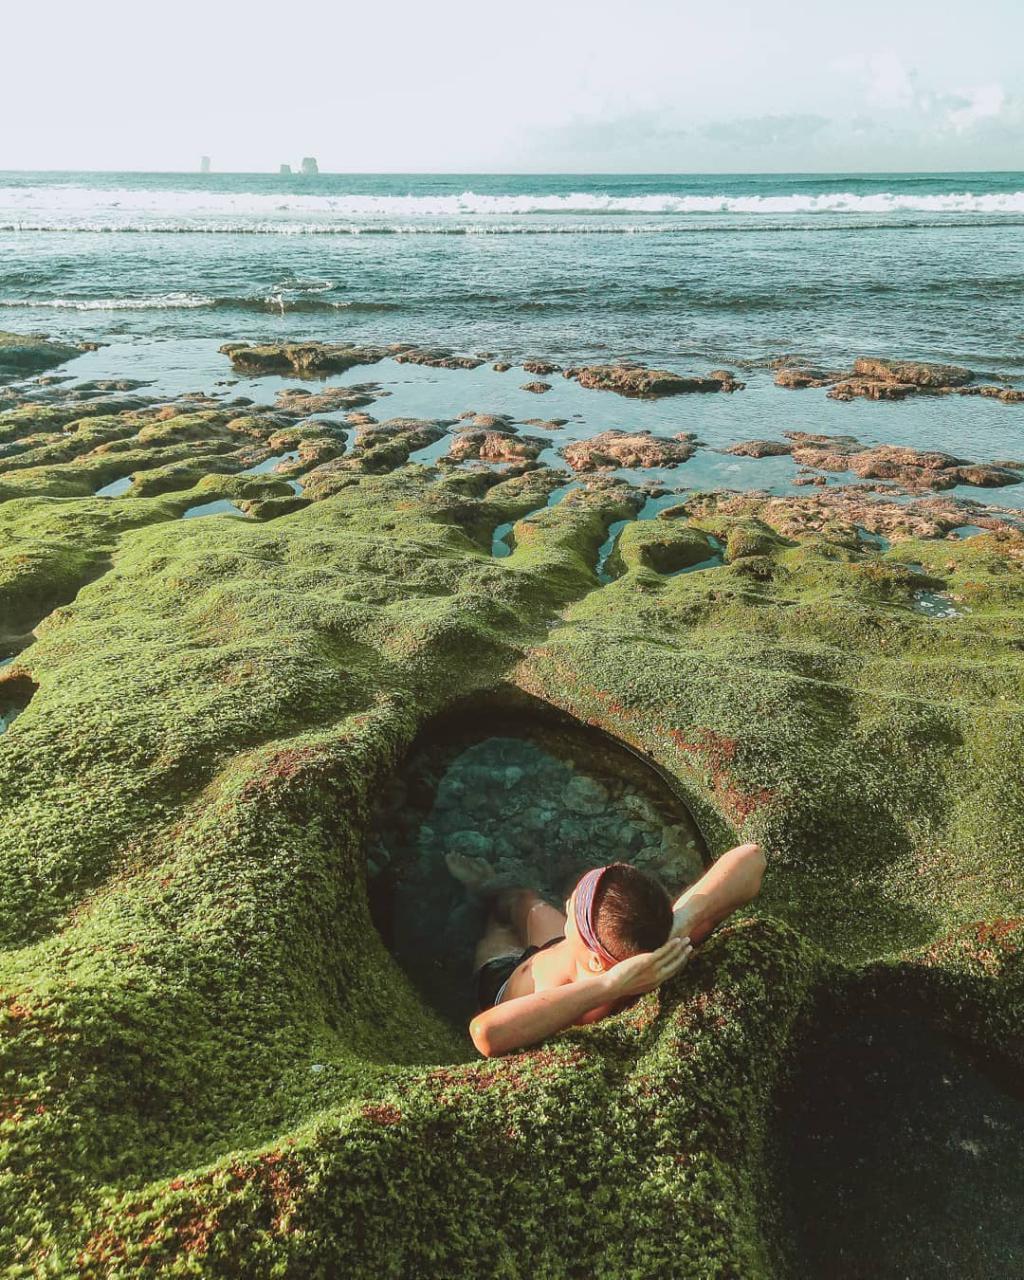 Pantai di Malang yang belum terjamah, Pantai Parang Dowo / Pantai Paranglot.